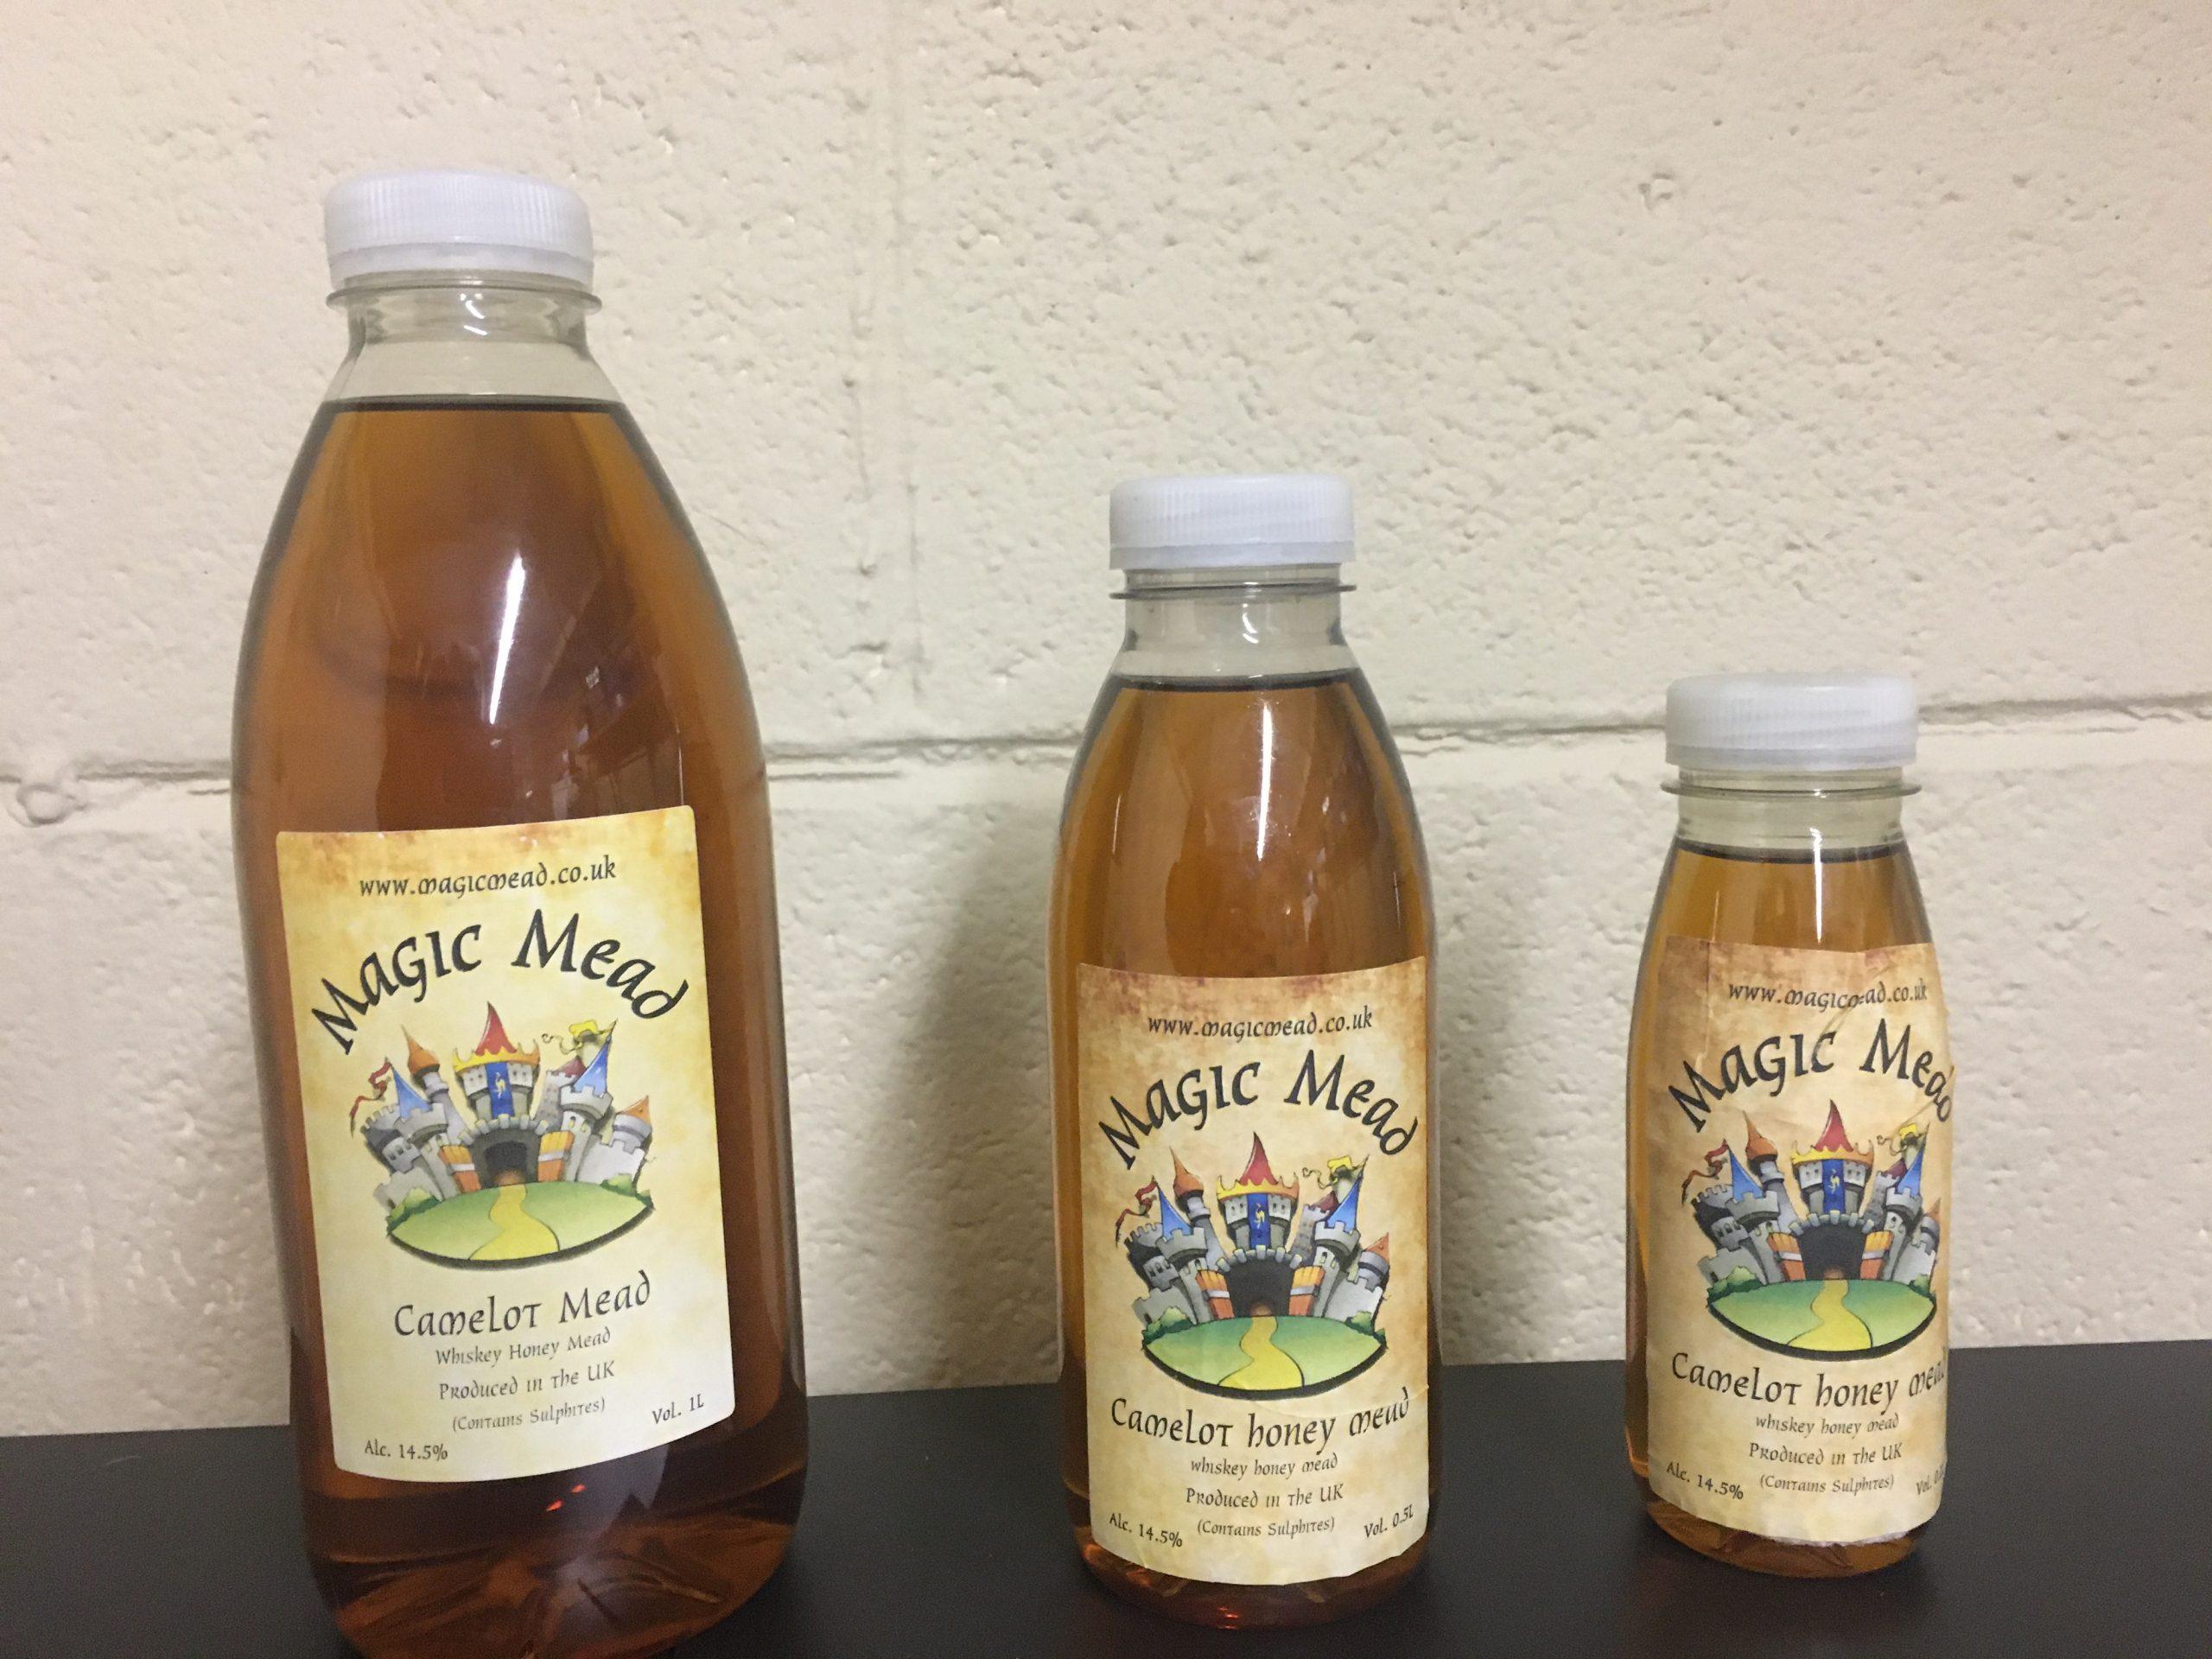 Kiwi Honey Mead (Elf Dew)